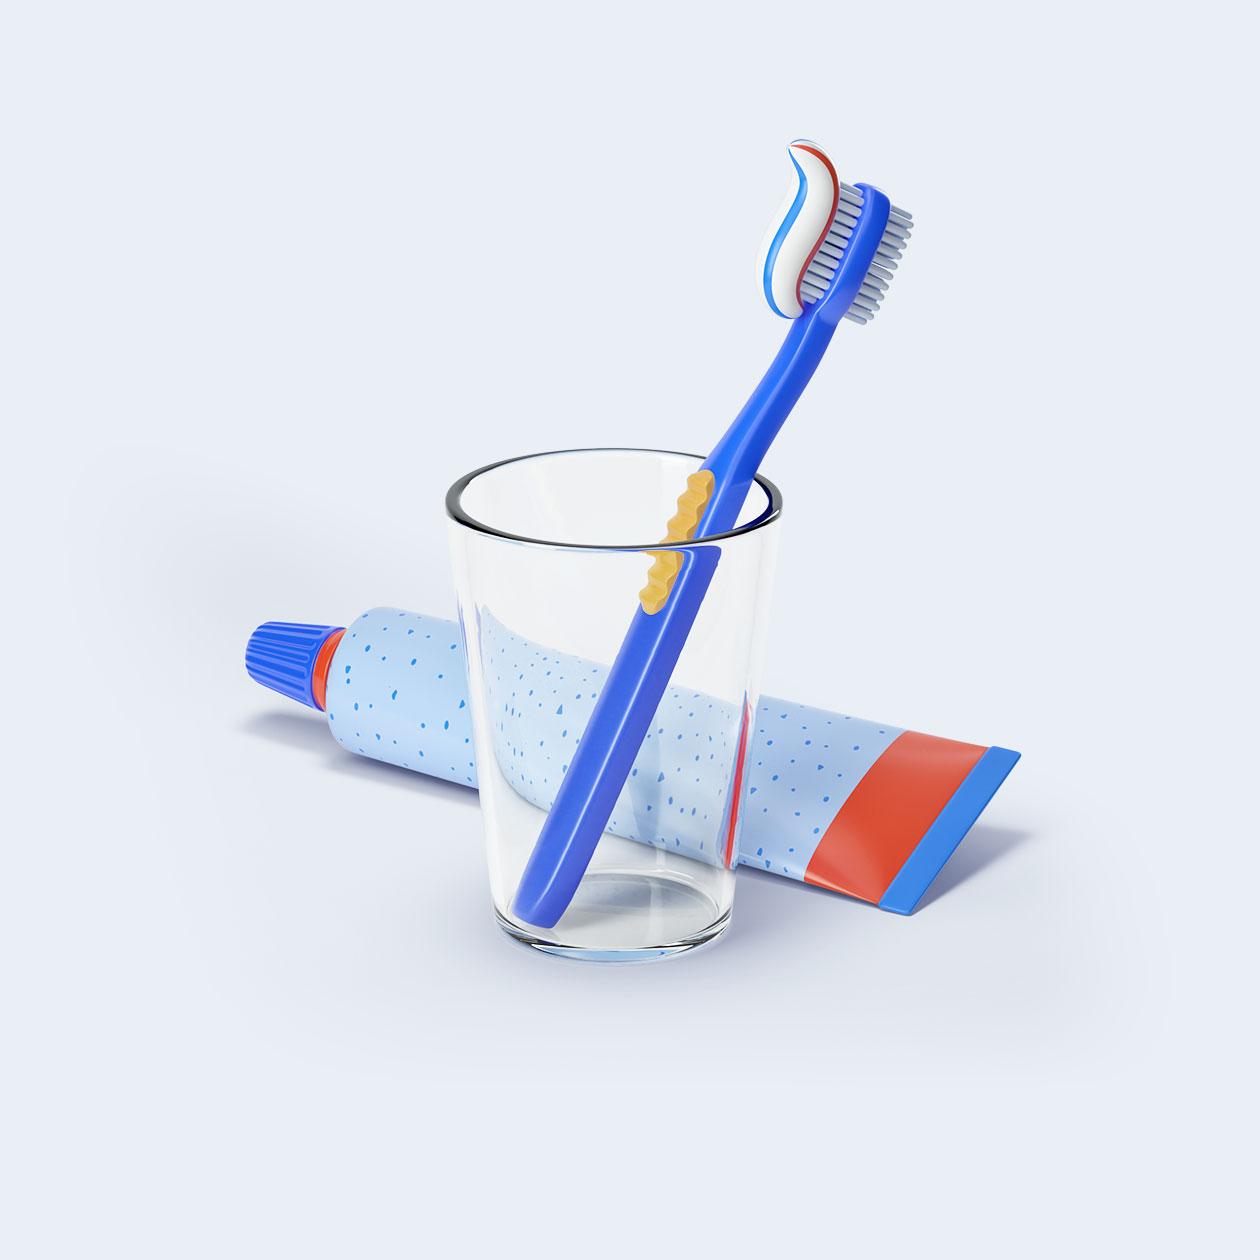 foreal_wakam_toothbrush